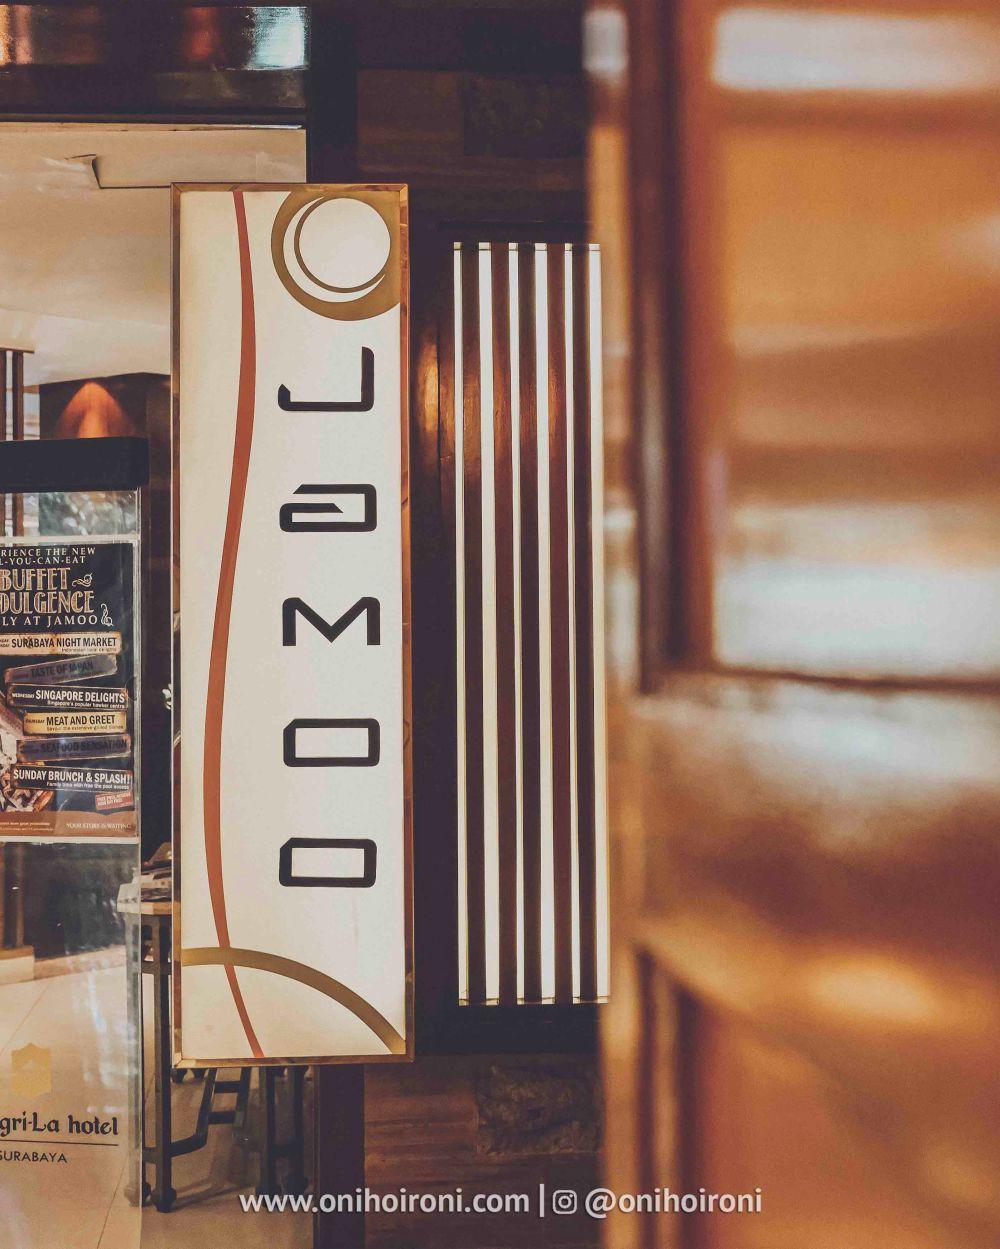 6 Review food Jamoo Restaurant Shangrila Surabaya Hotel Oni hoironi